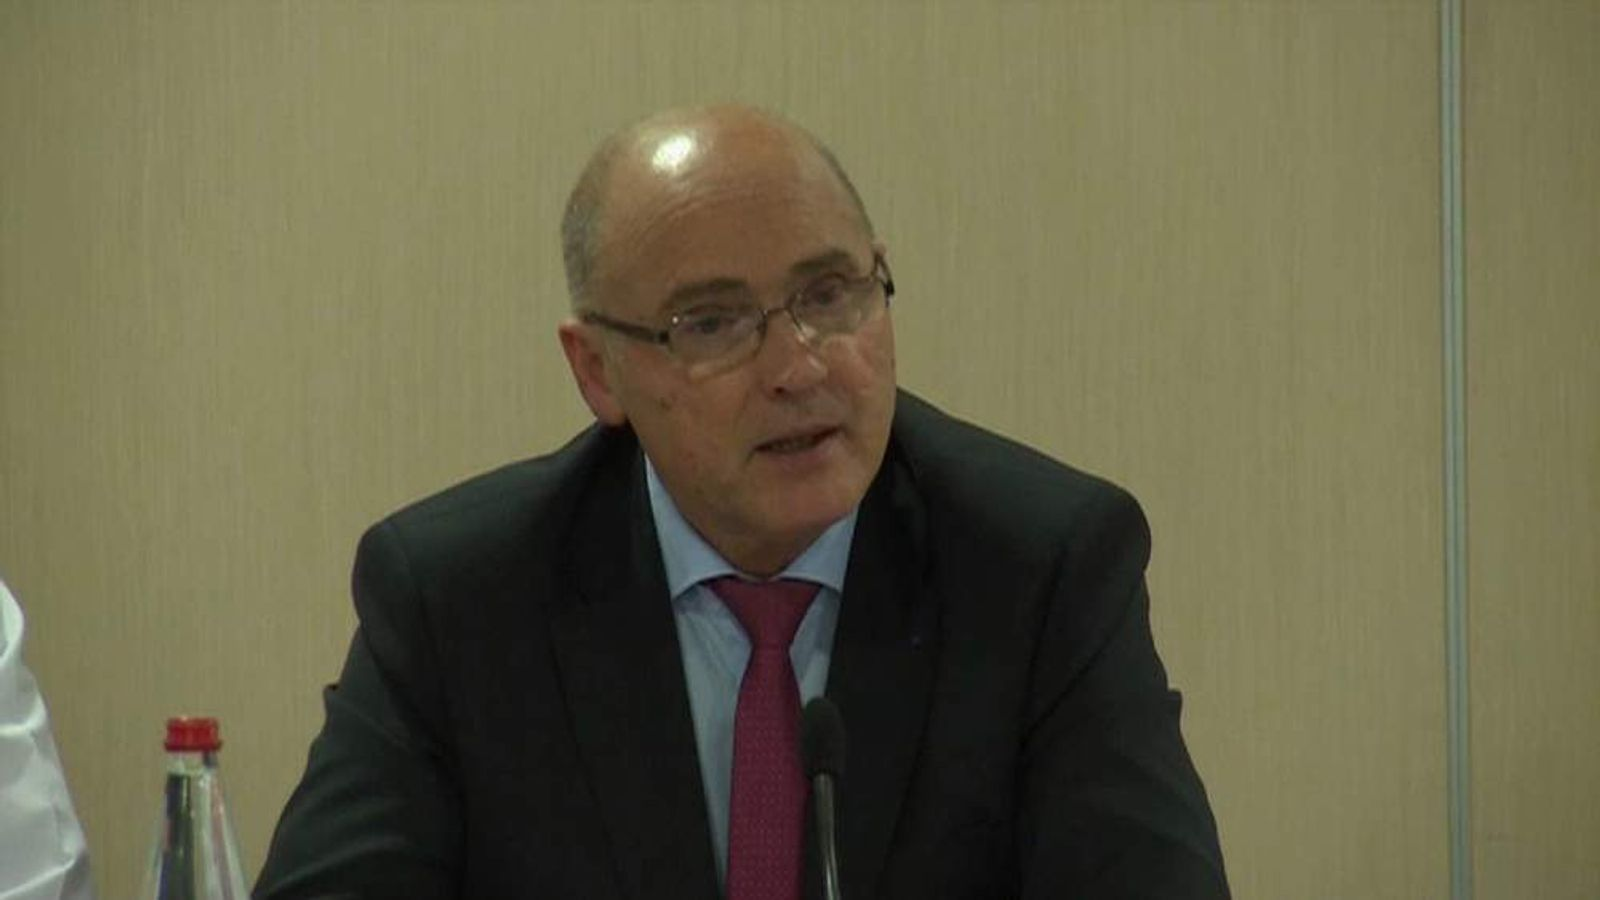 Marseille Prosecutor, Brice Robin